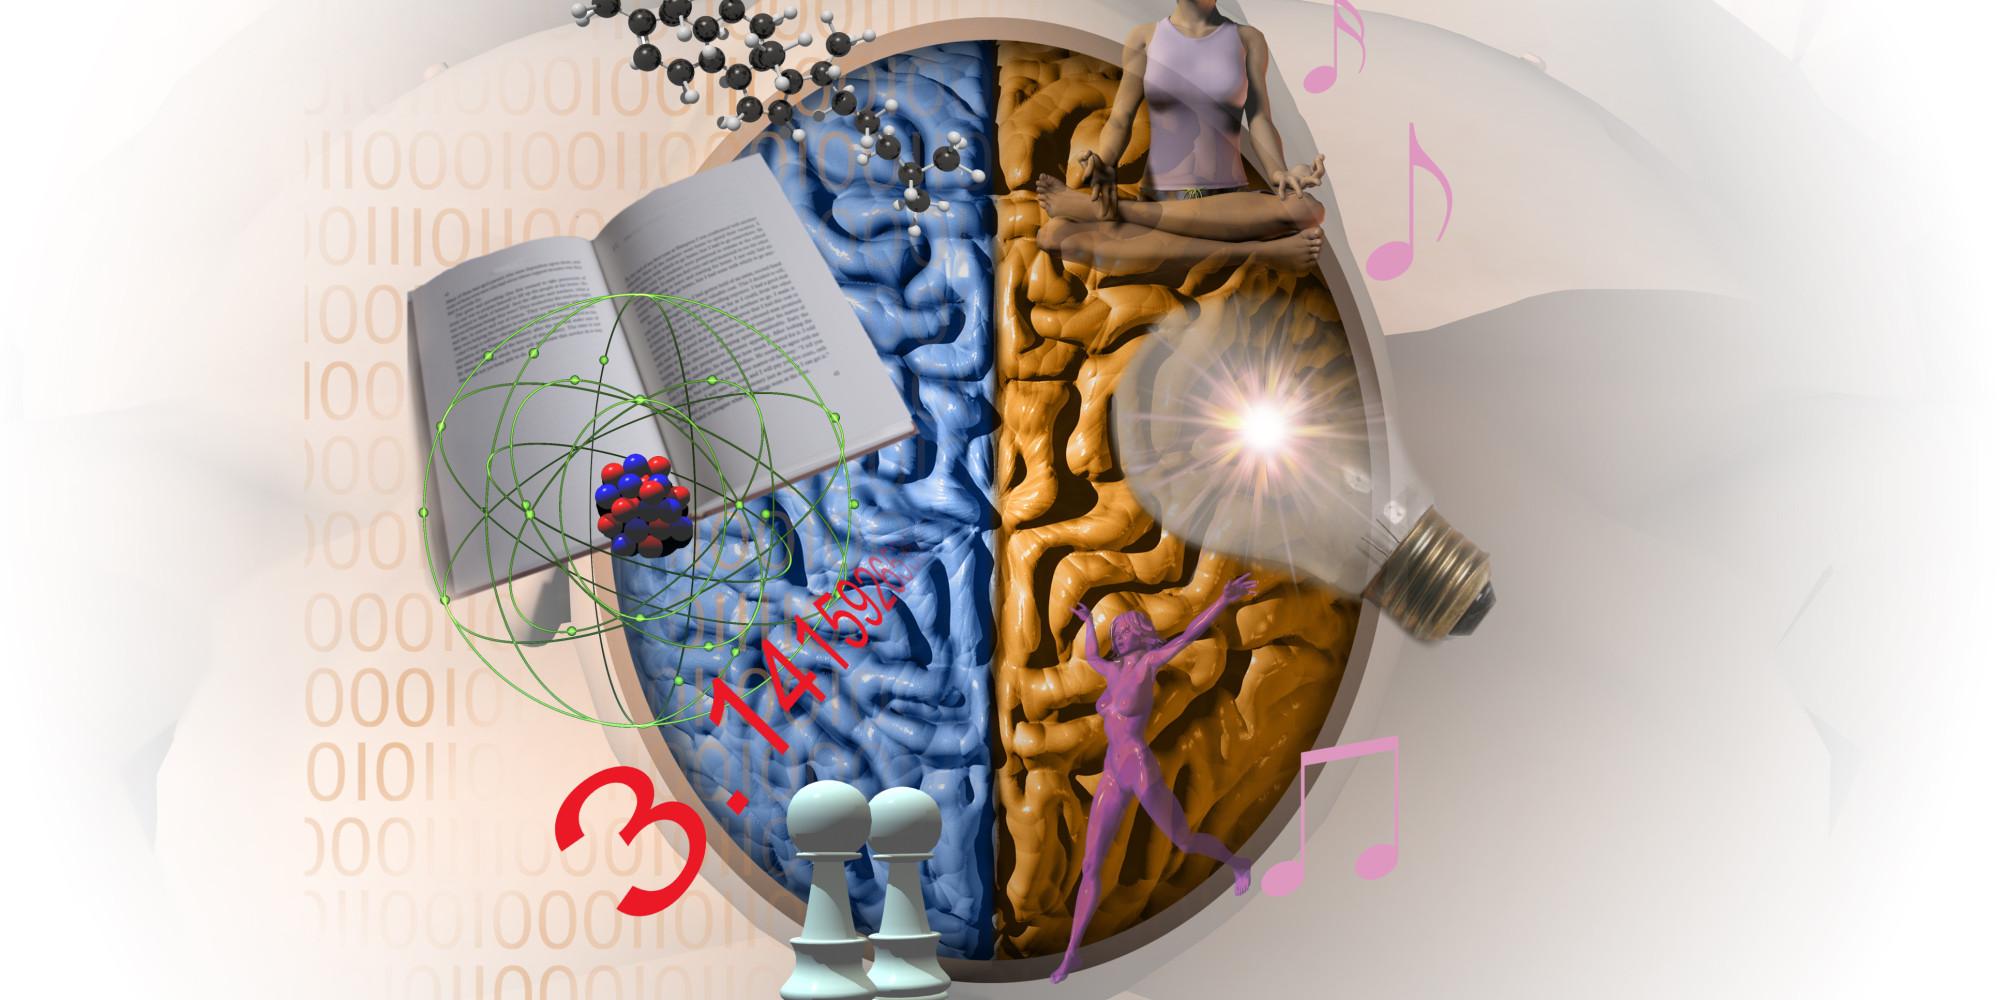 Is An Ideal Entrepreneur Right Brain Or Left Brain? | HuffPost